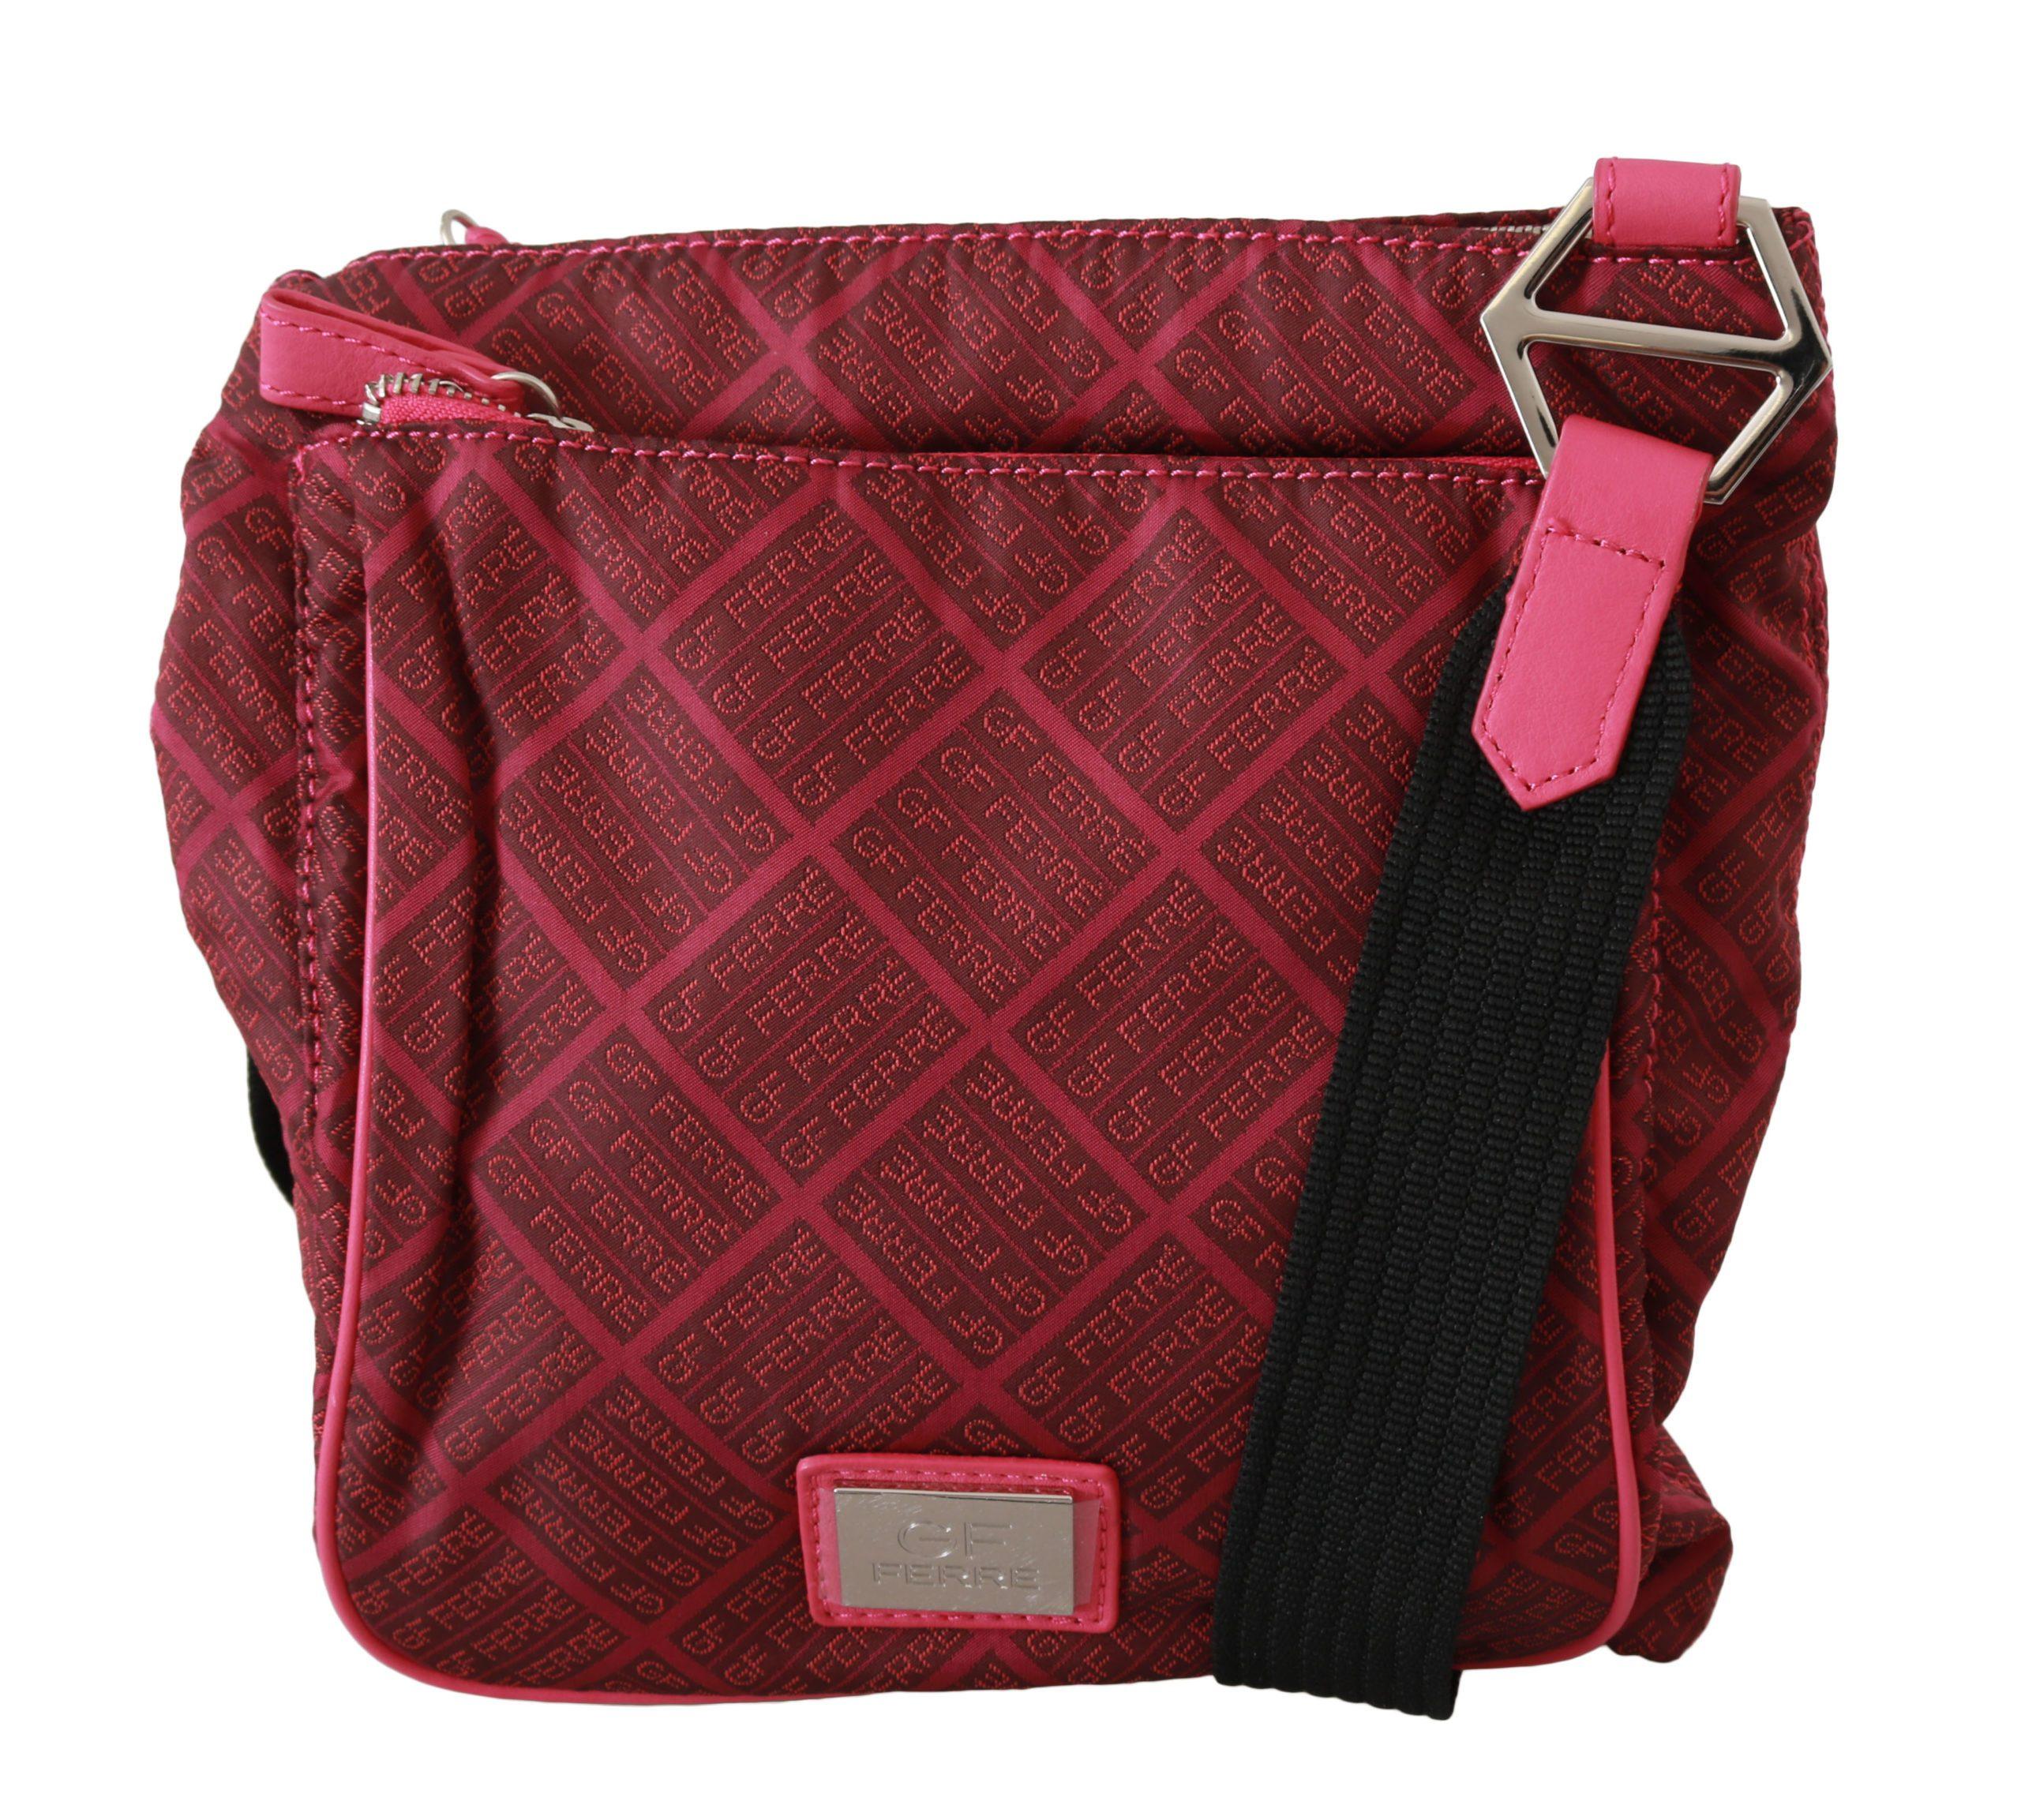 GF Ferre Women's Printed Fabric Shoulder Bag Pink VAS9191